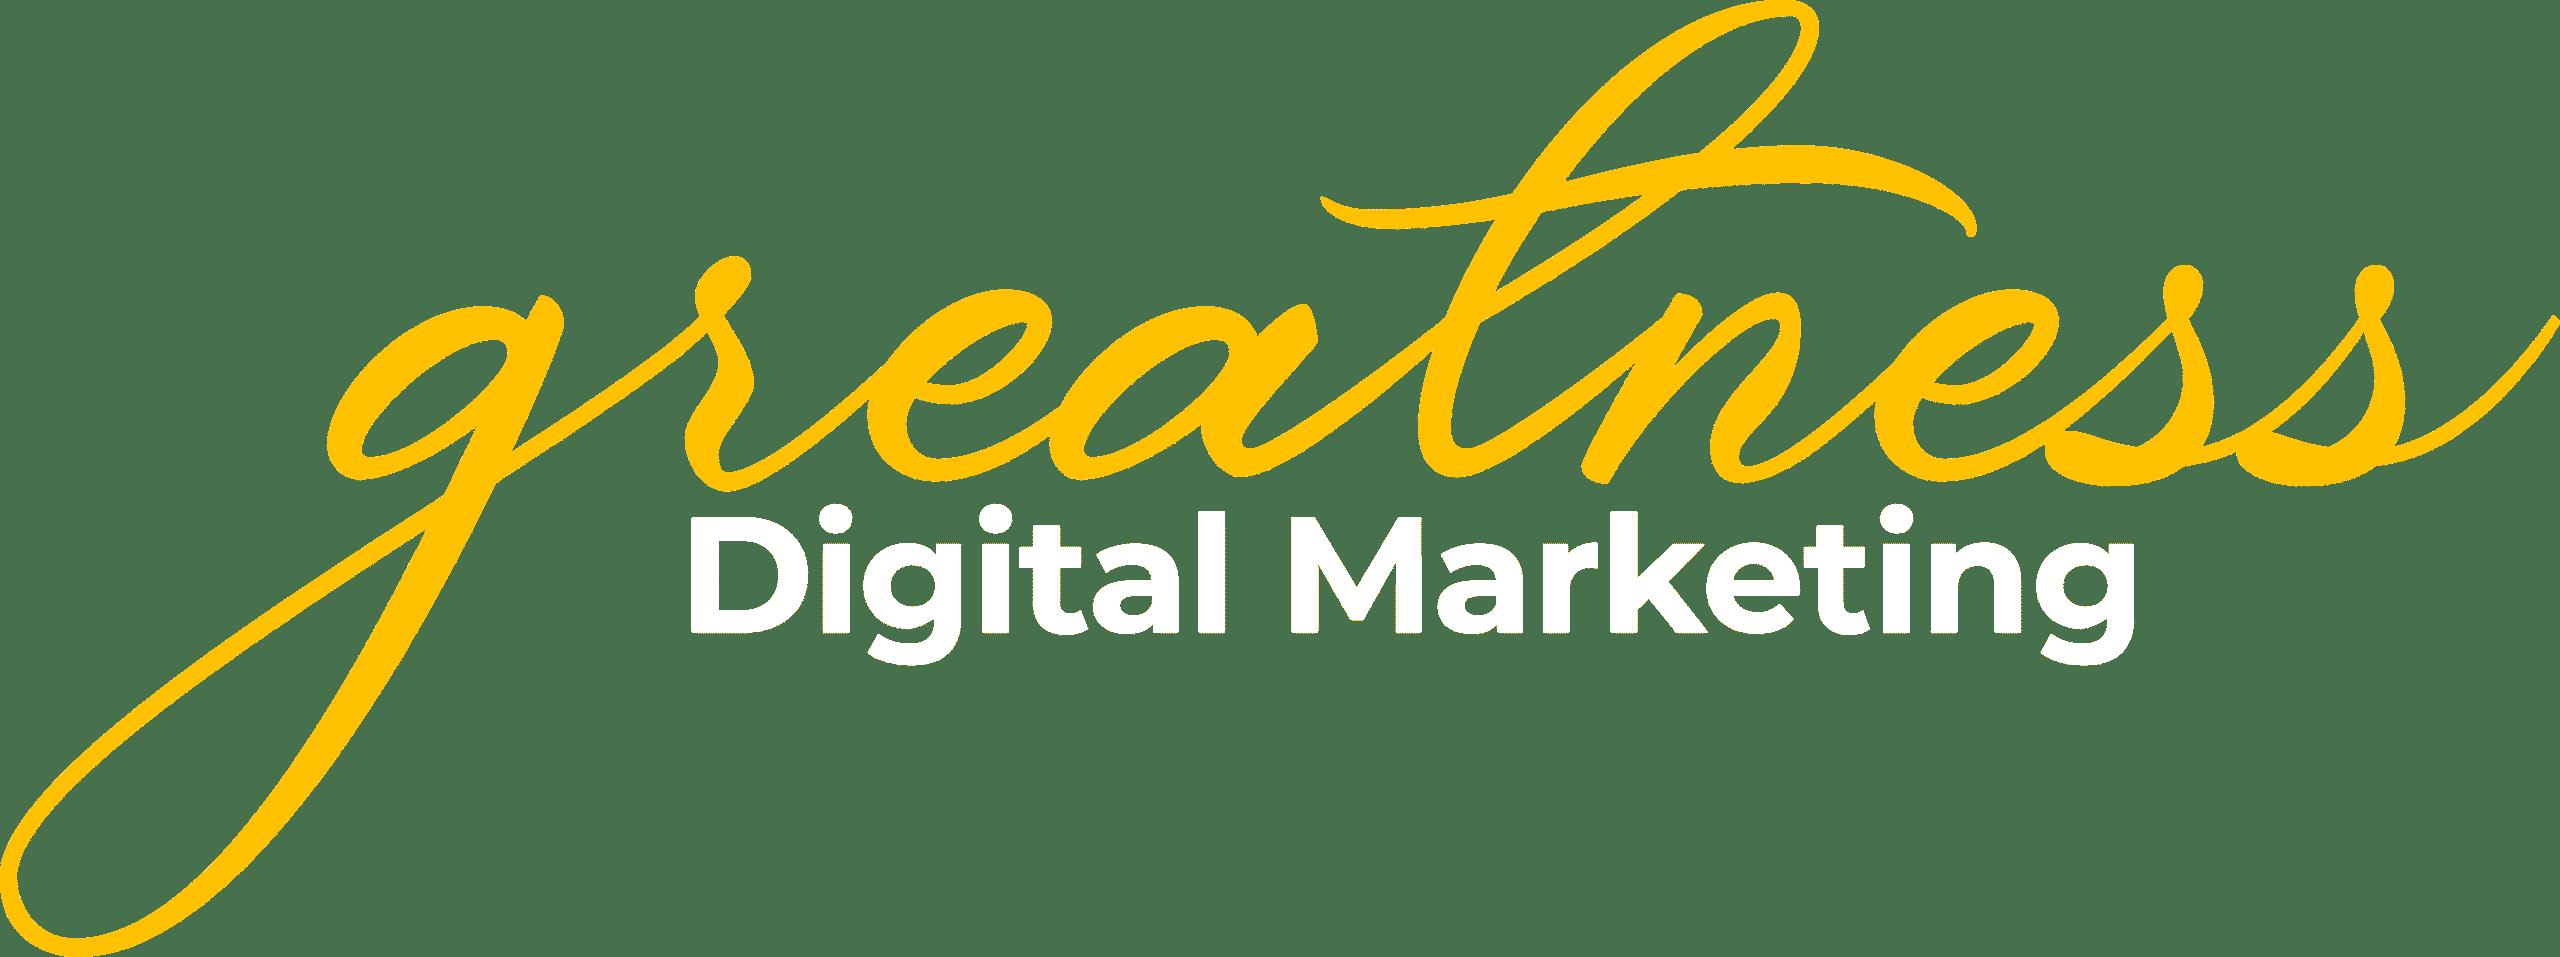 greatness digital logo